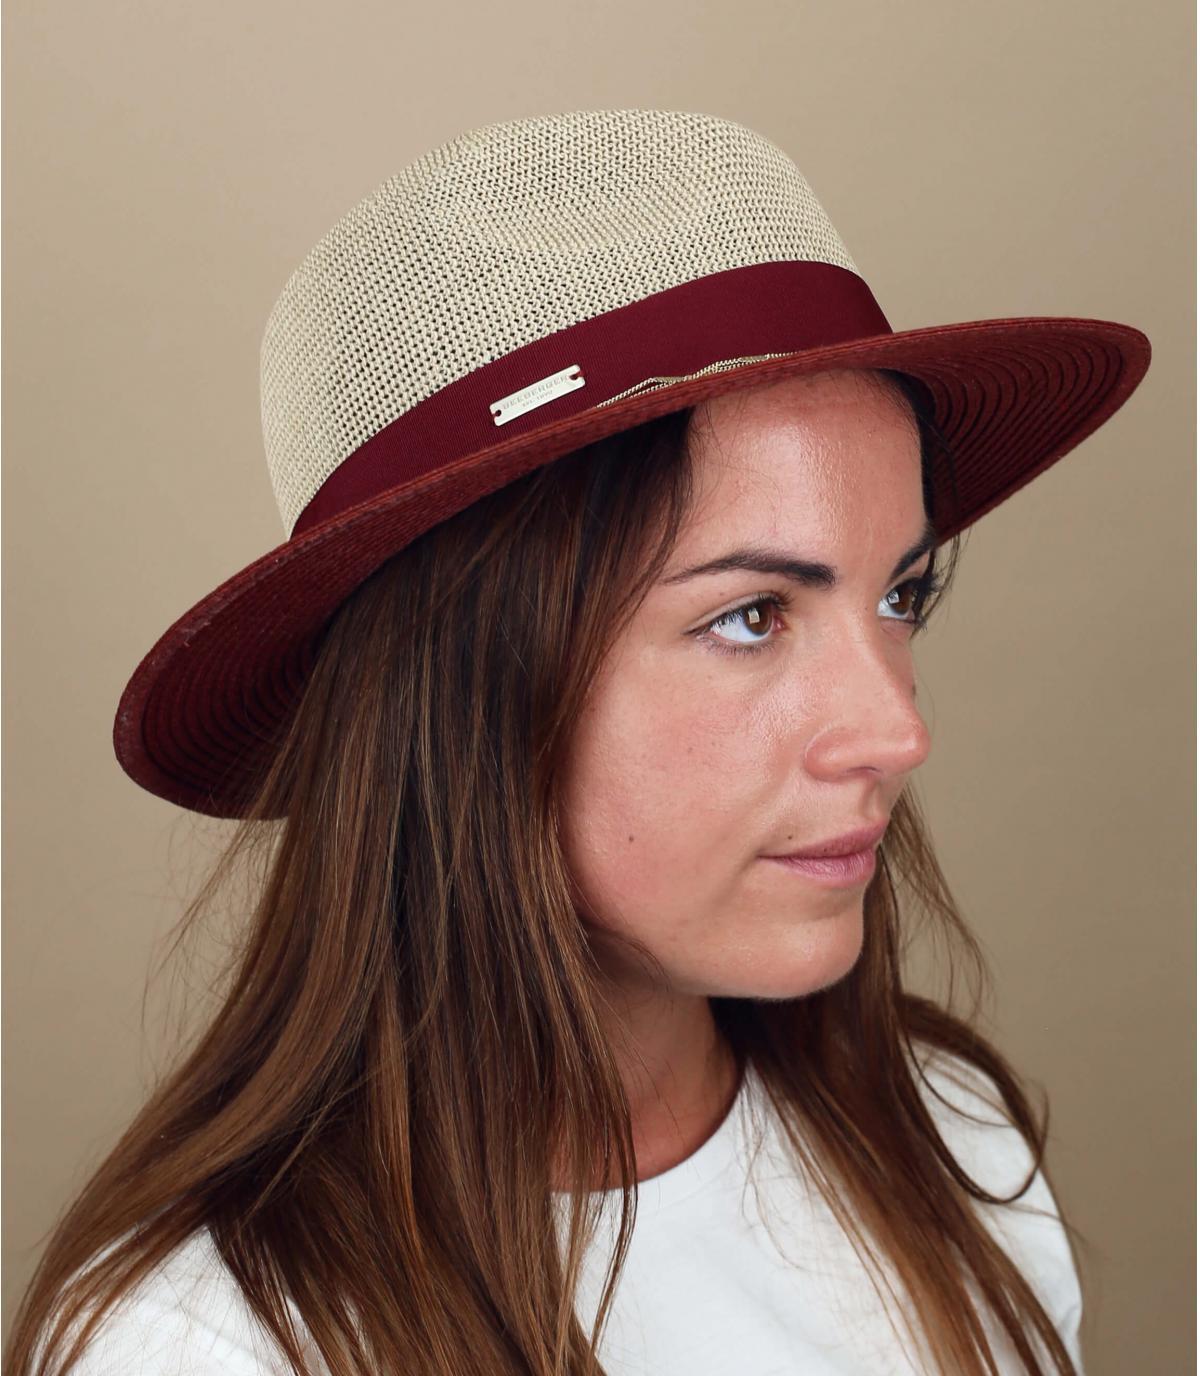 chapeau paille chaine or